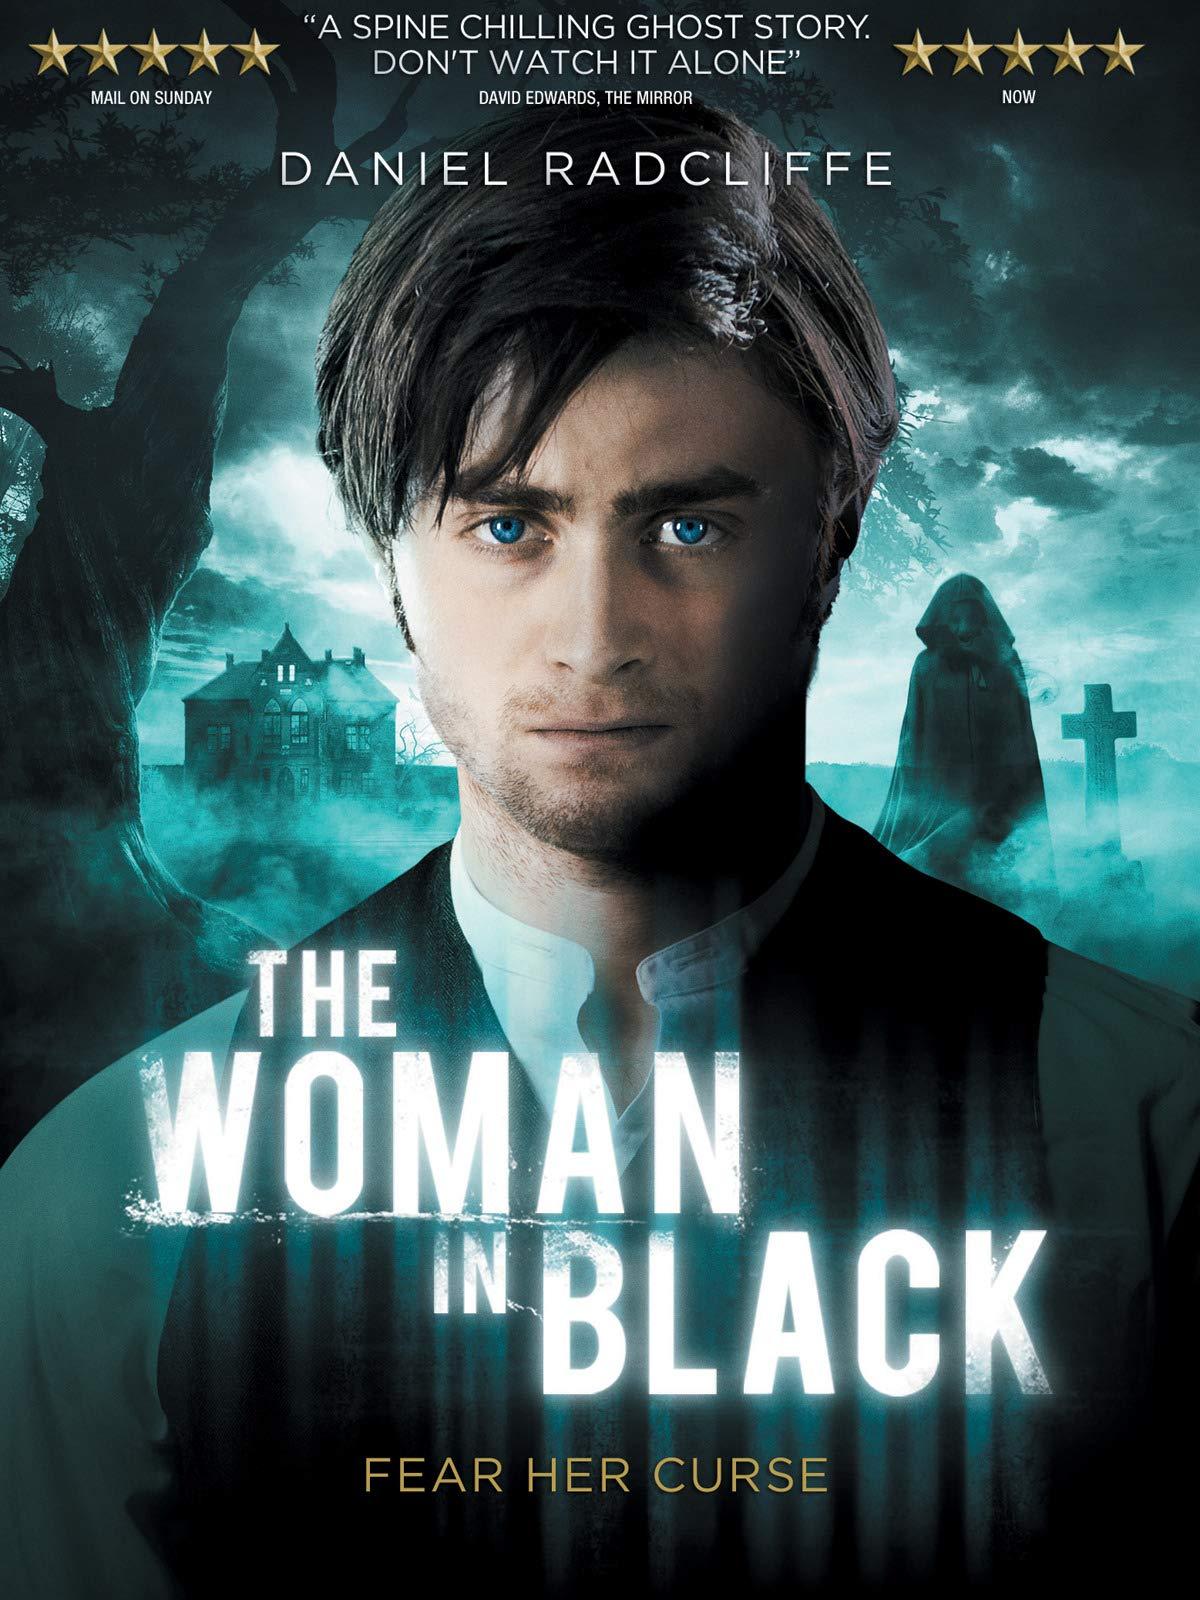 The Woman in Black (2012) Hindi English Dual Audio Horror Thriller || 480p, 720p